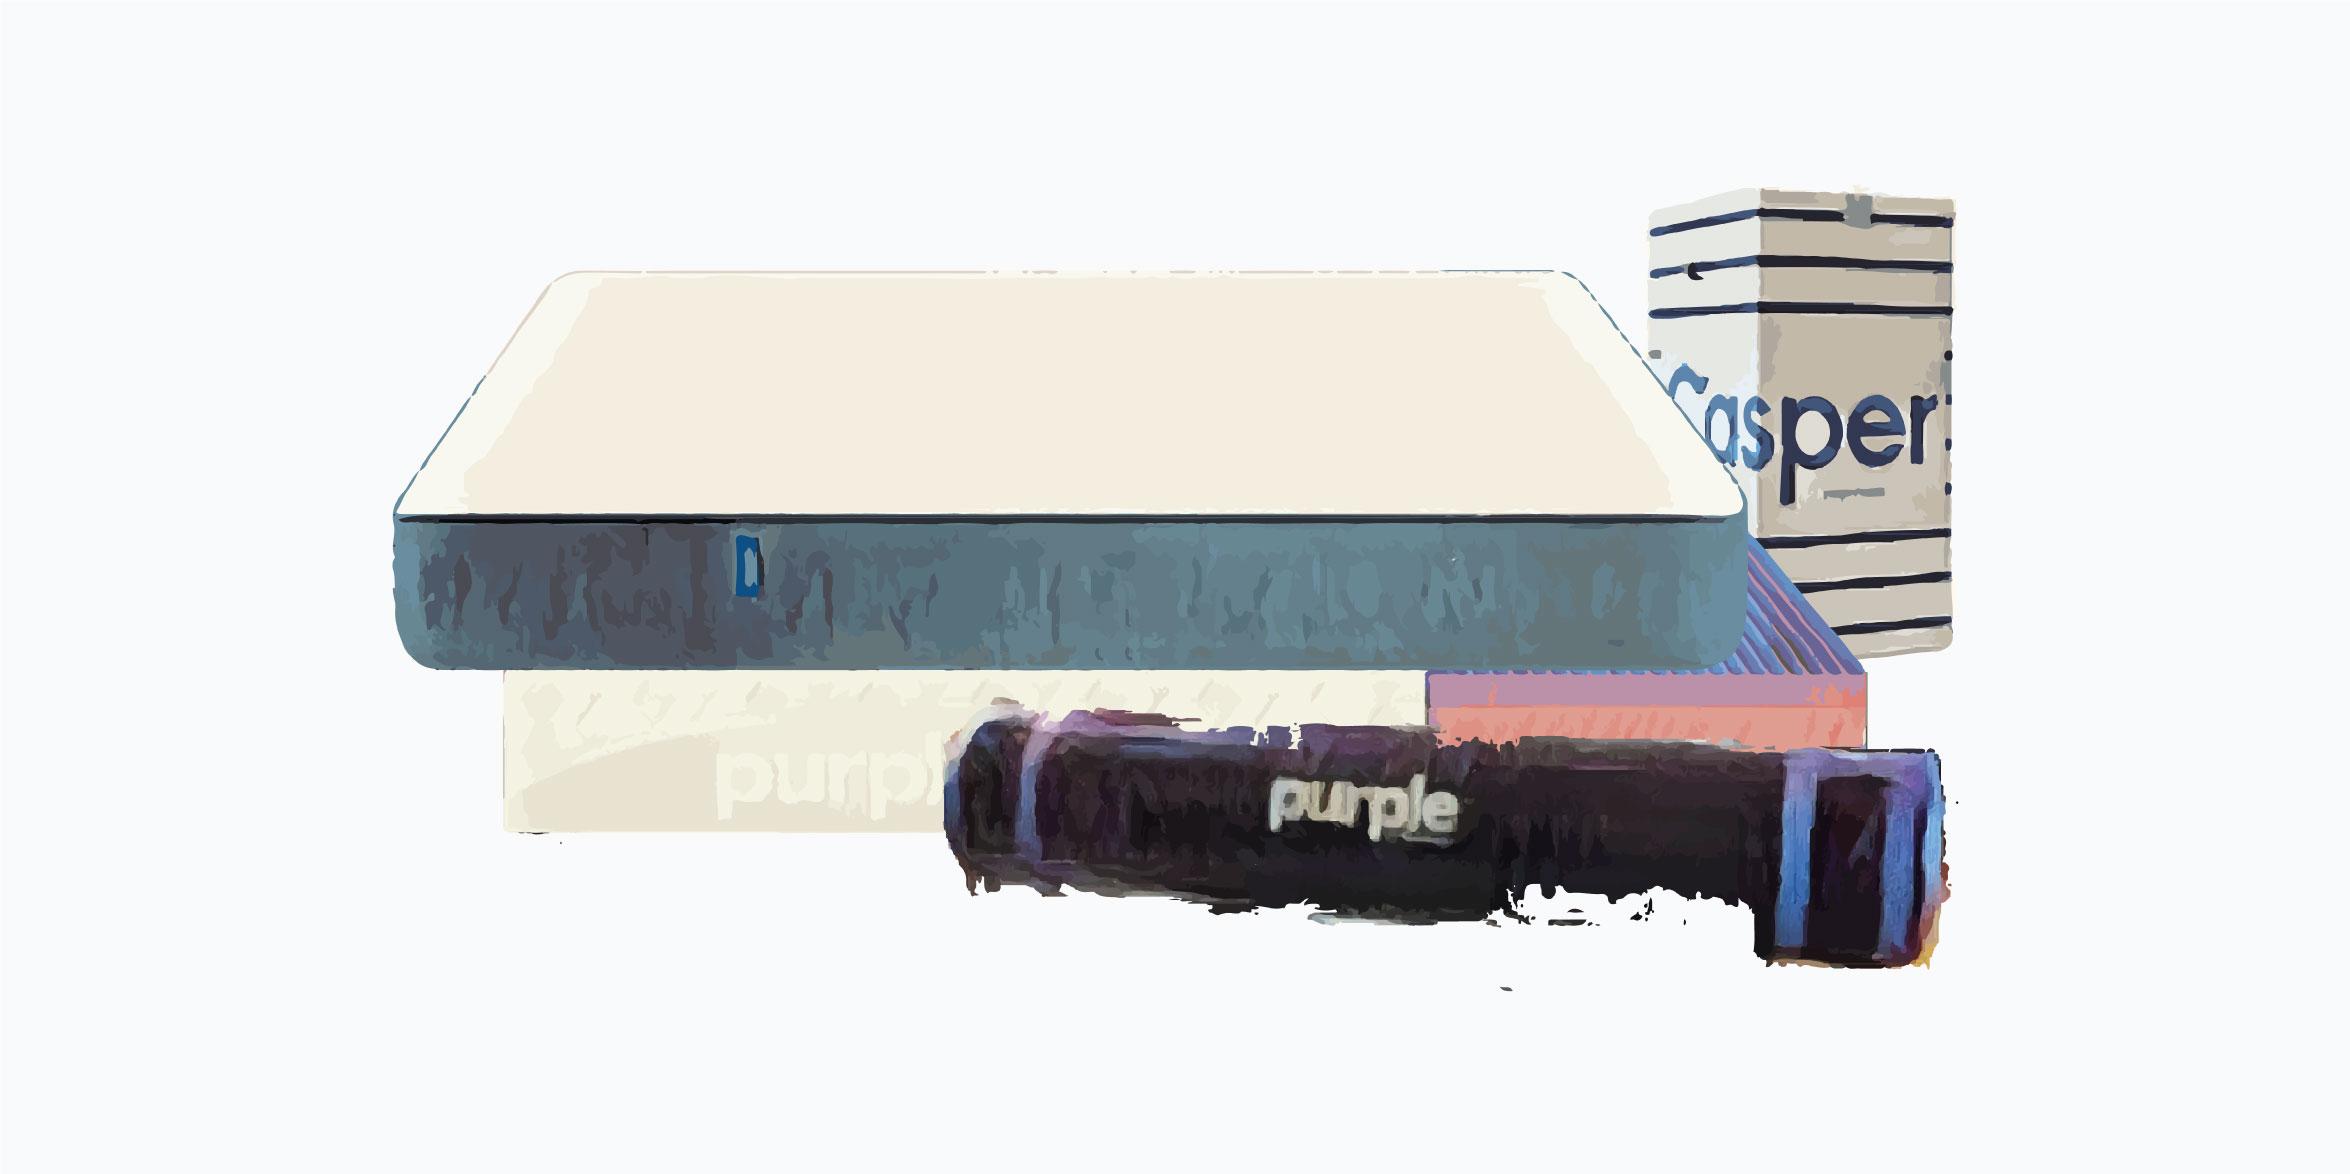 Casper vs. Purple